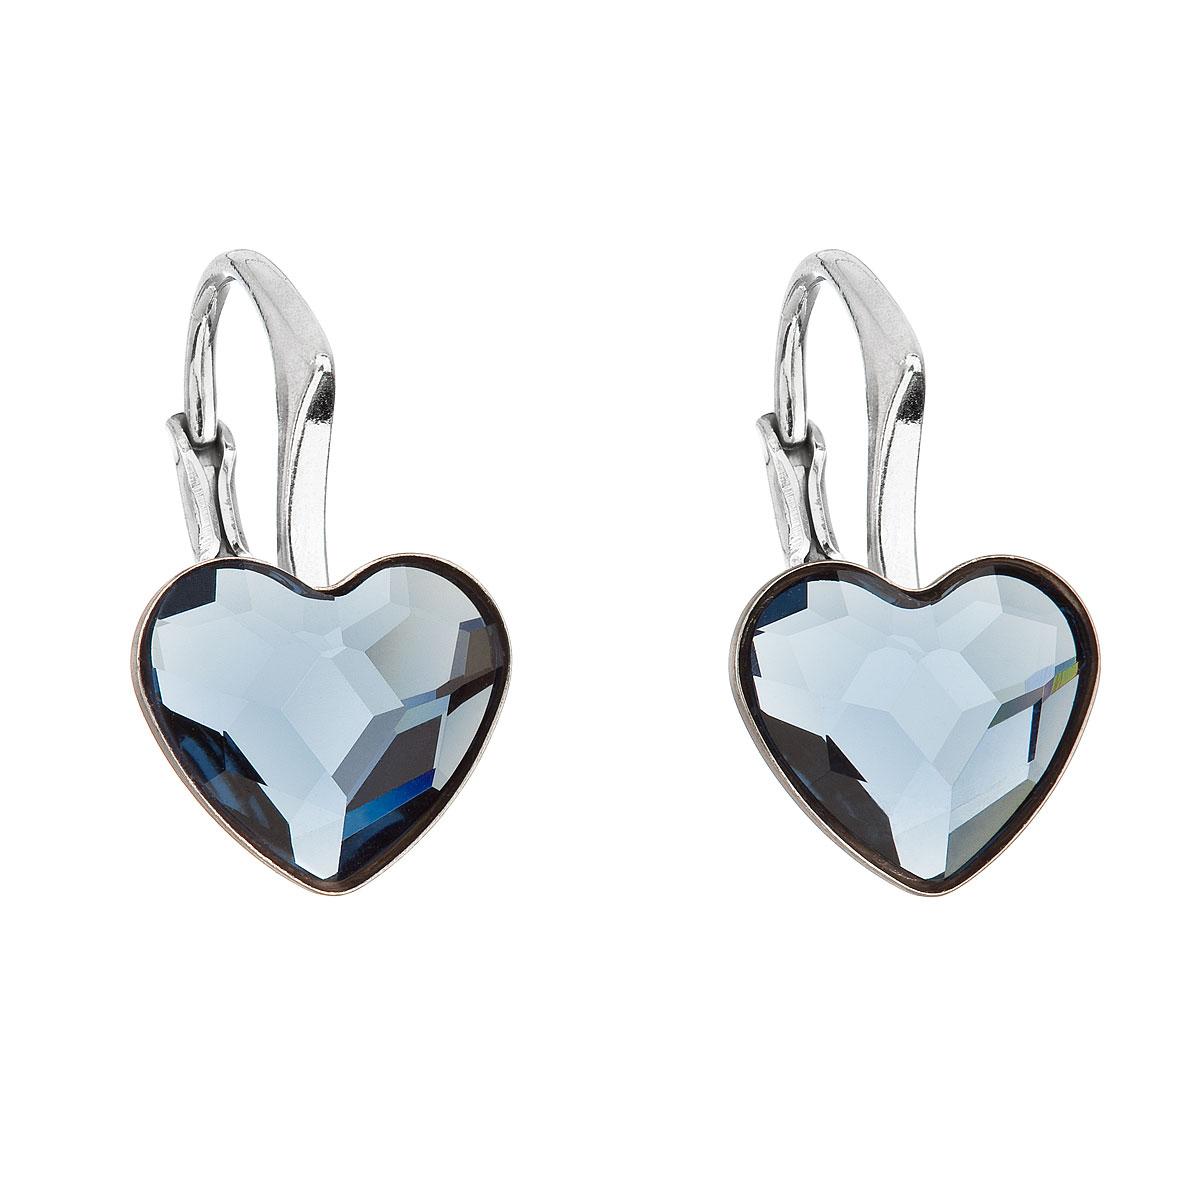 Strieborné náušnice visiace s krištáľmi Swarovski modré srdce 31240.3